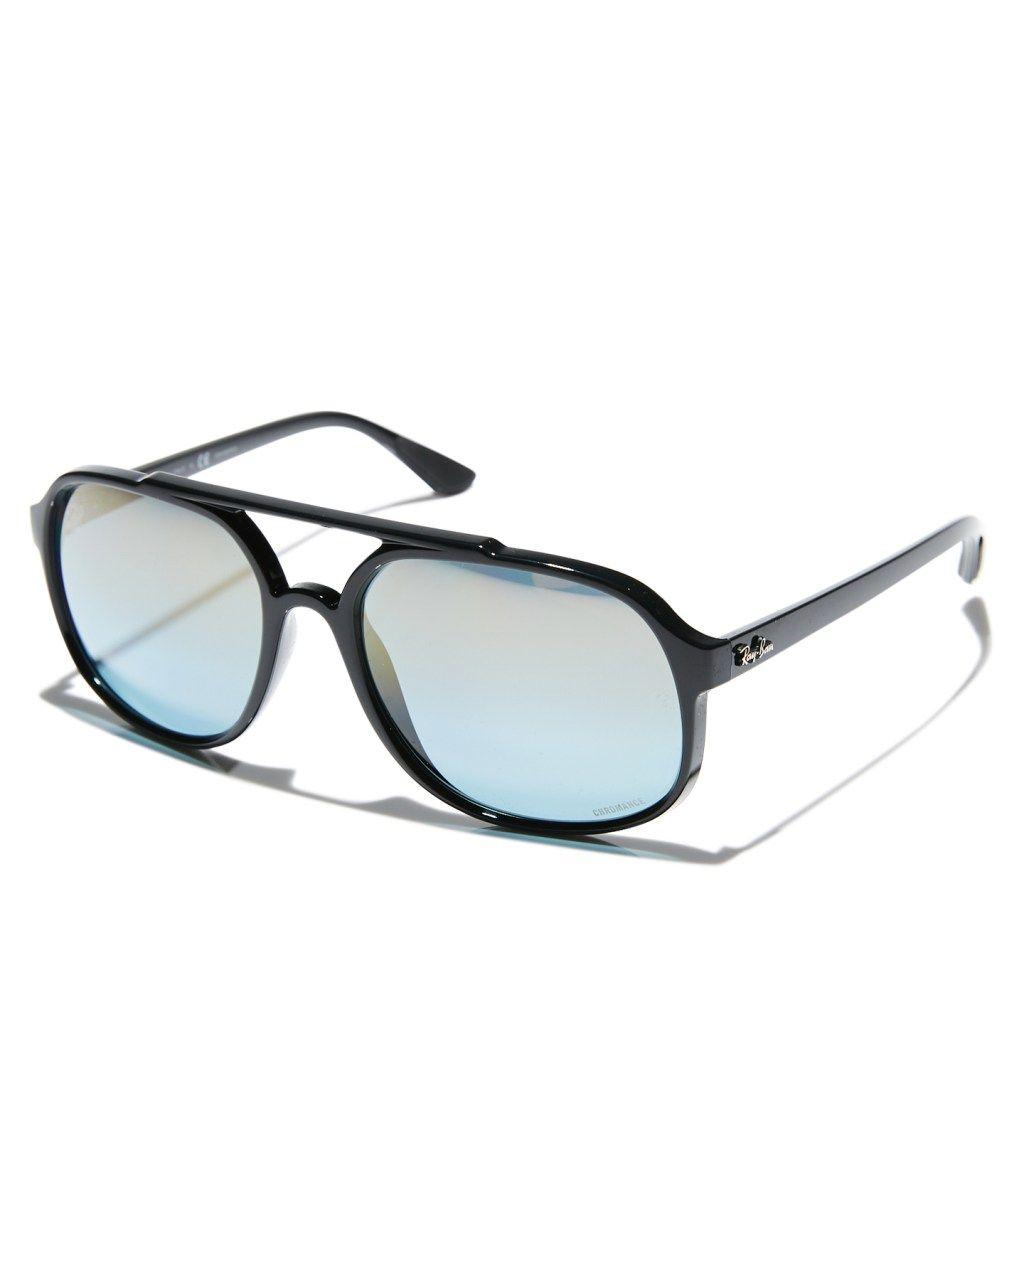 9f7c97e41b6 Ray-Ban Rb4312Ch Sunglasses Black Blue Mirror Mens sunglasses Size ...